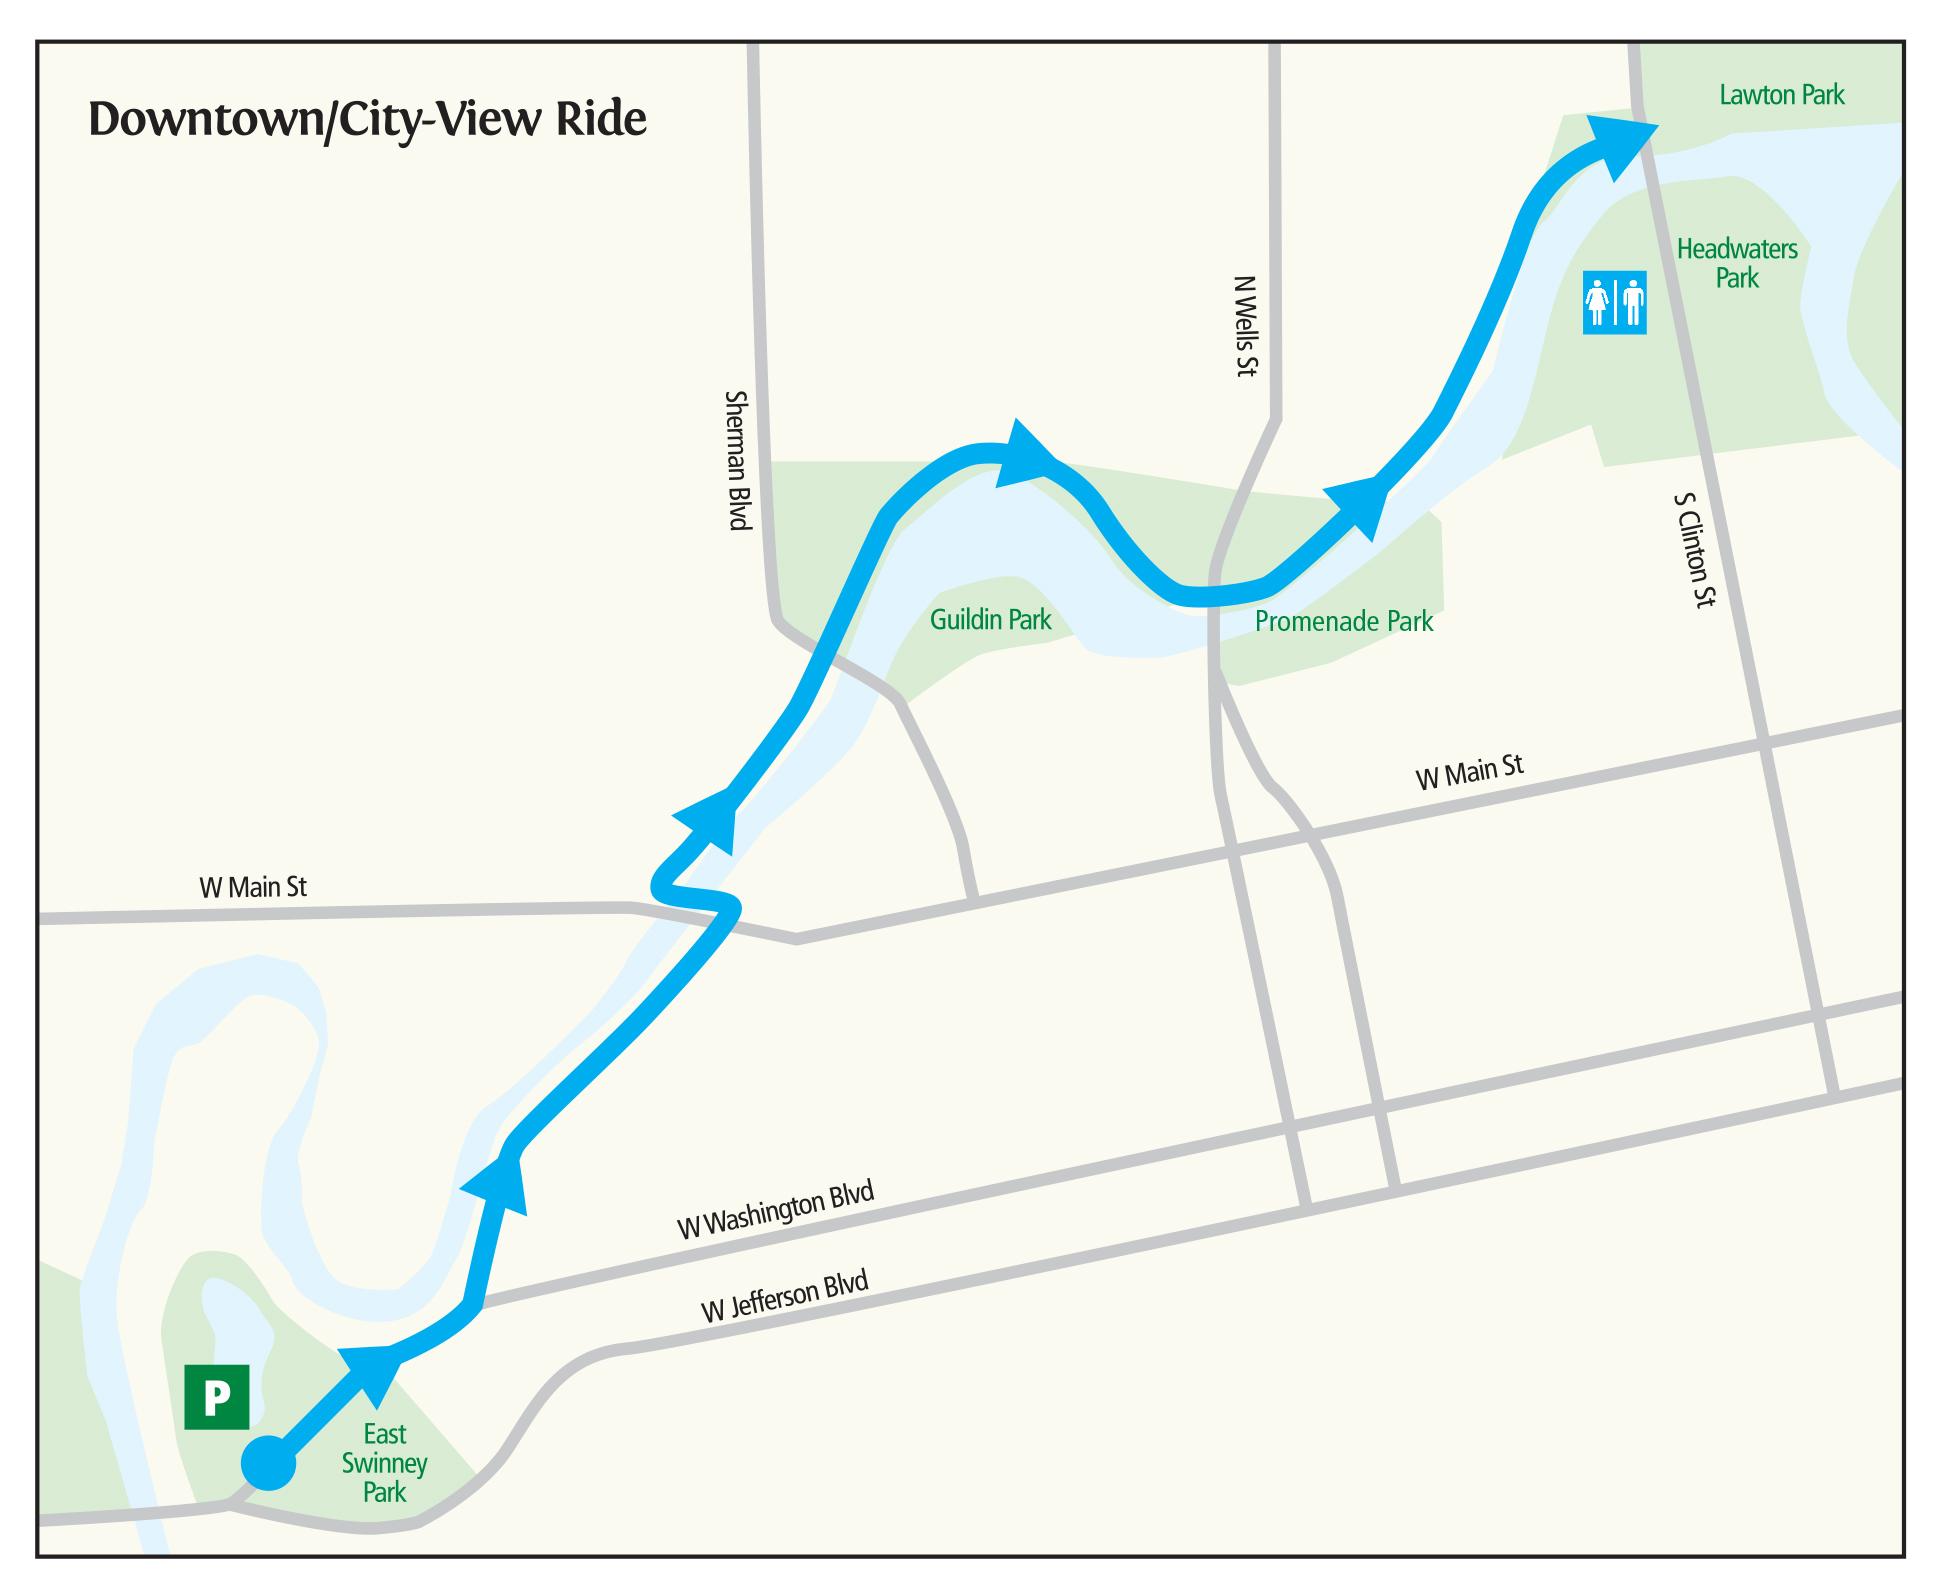 Map Of Wayne County Pa, City View Trail Ride Itinerary, Map Of Wayne County Pa